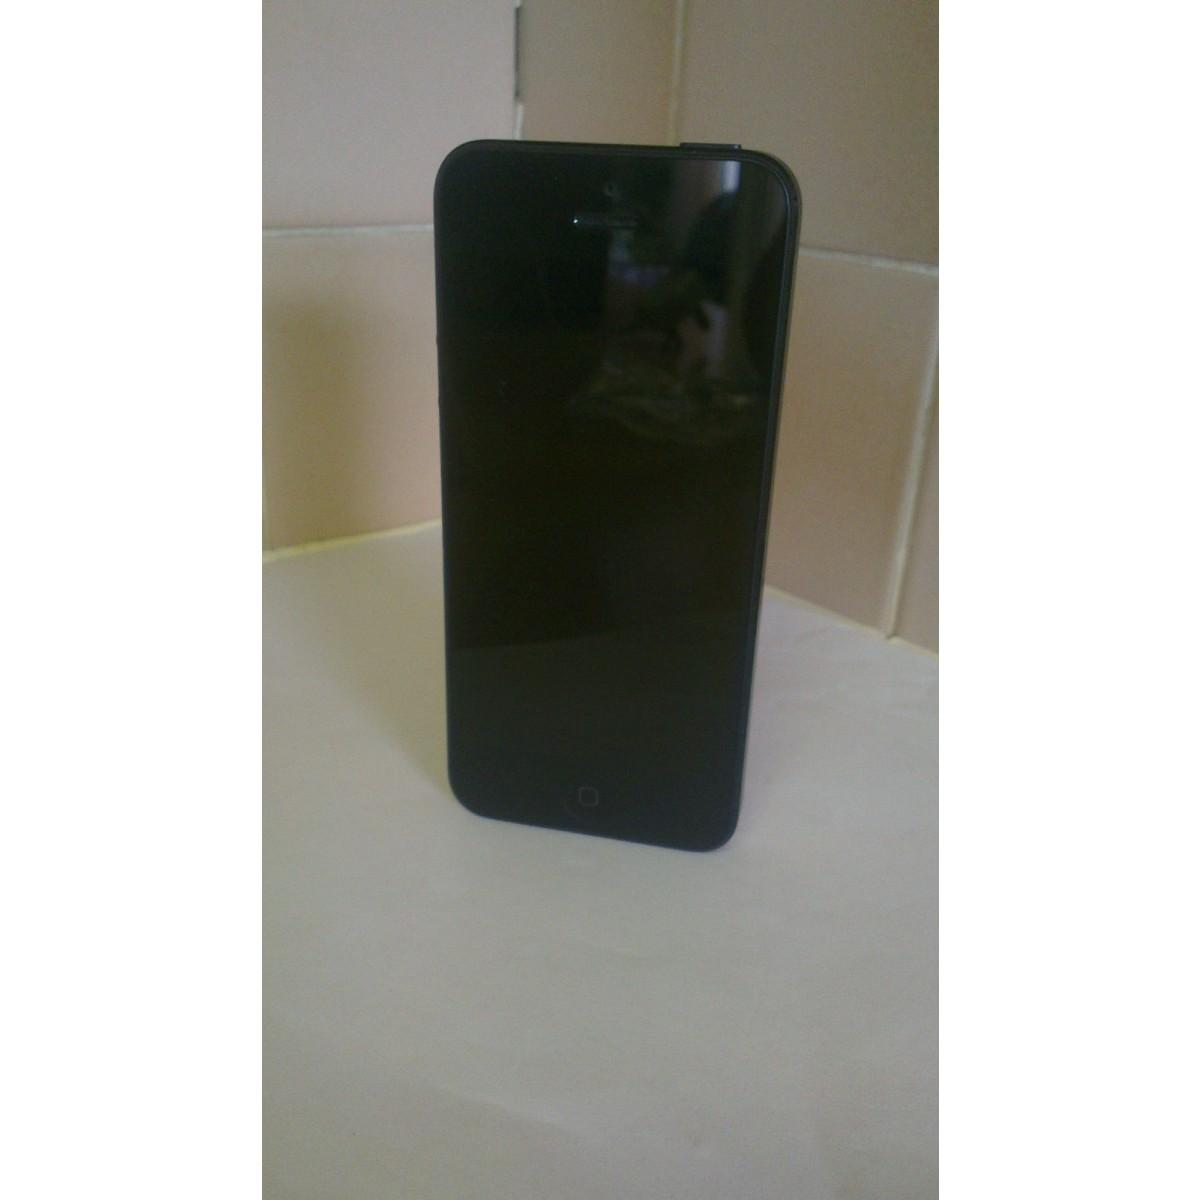 Harga Jual Apple Iphone 5 32 Gb Terbaru 2018 Fcenter Spring Bed Big Dream 2 In 1 Set Barbie Doll 100 Jawa Tengahdiyjawa Timur 32gb Black Slate Orange Smartphone Grade A